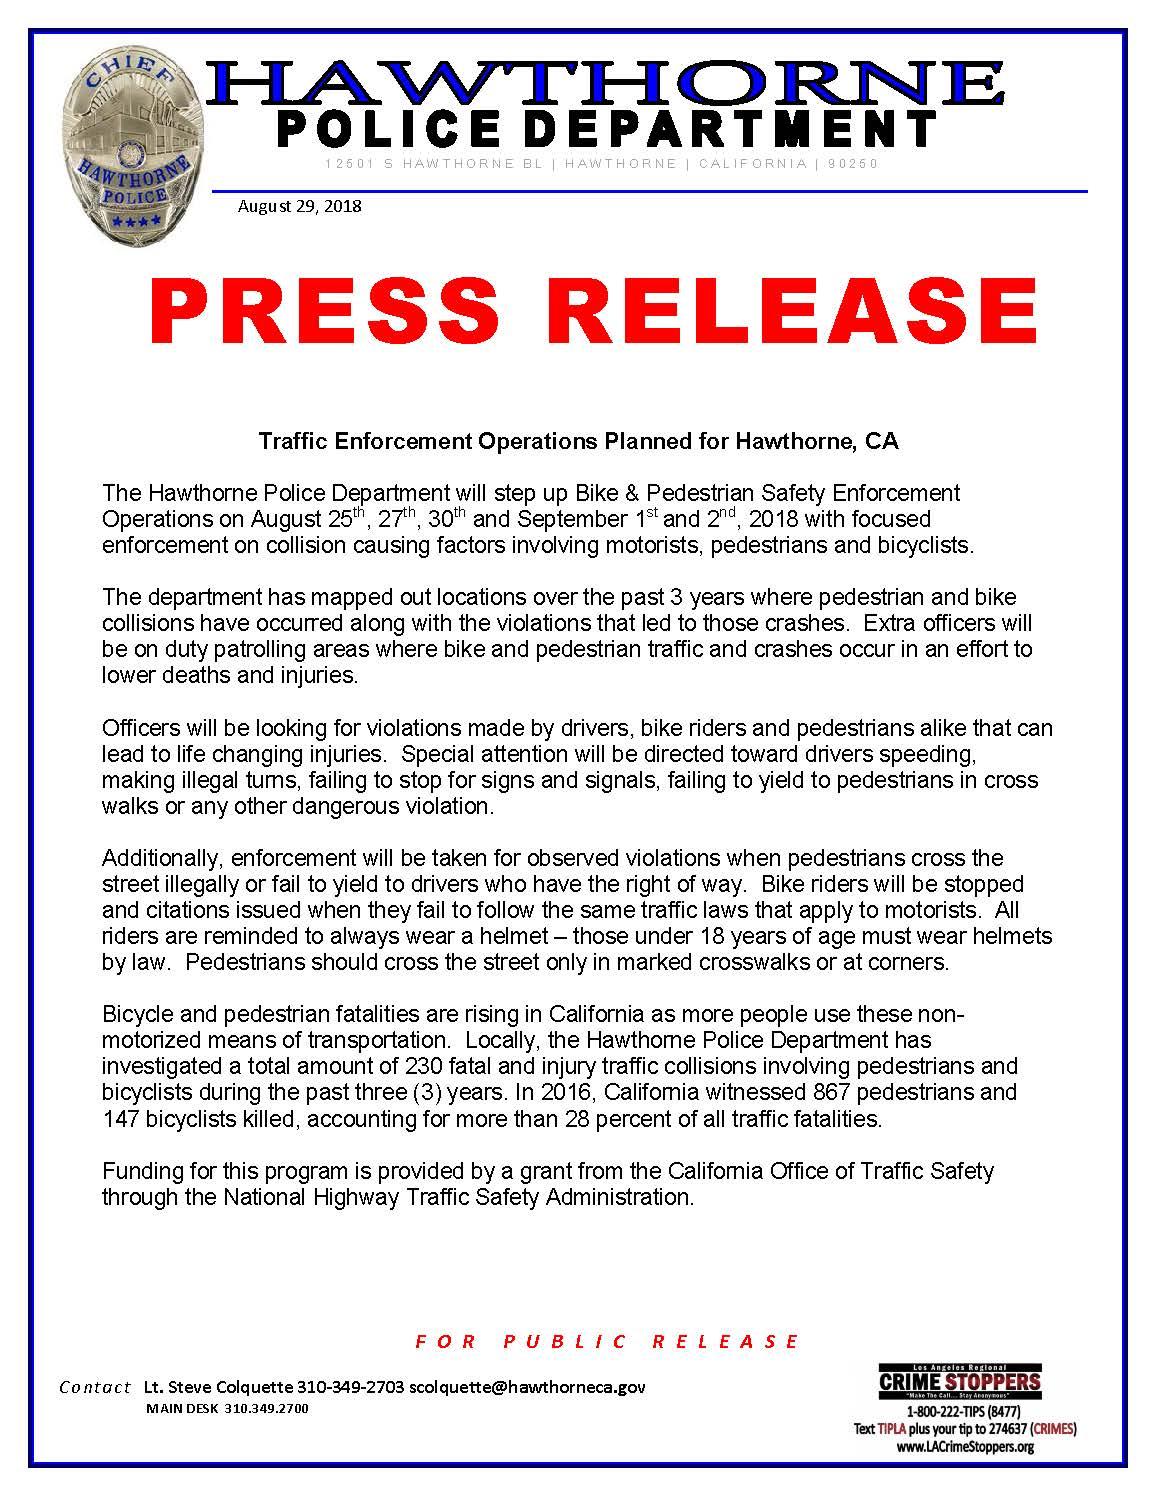 pd_press-Bike-Ped Op Press Release 08-25 to 09-0.jpg